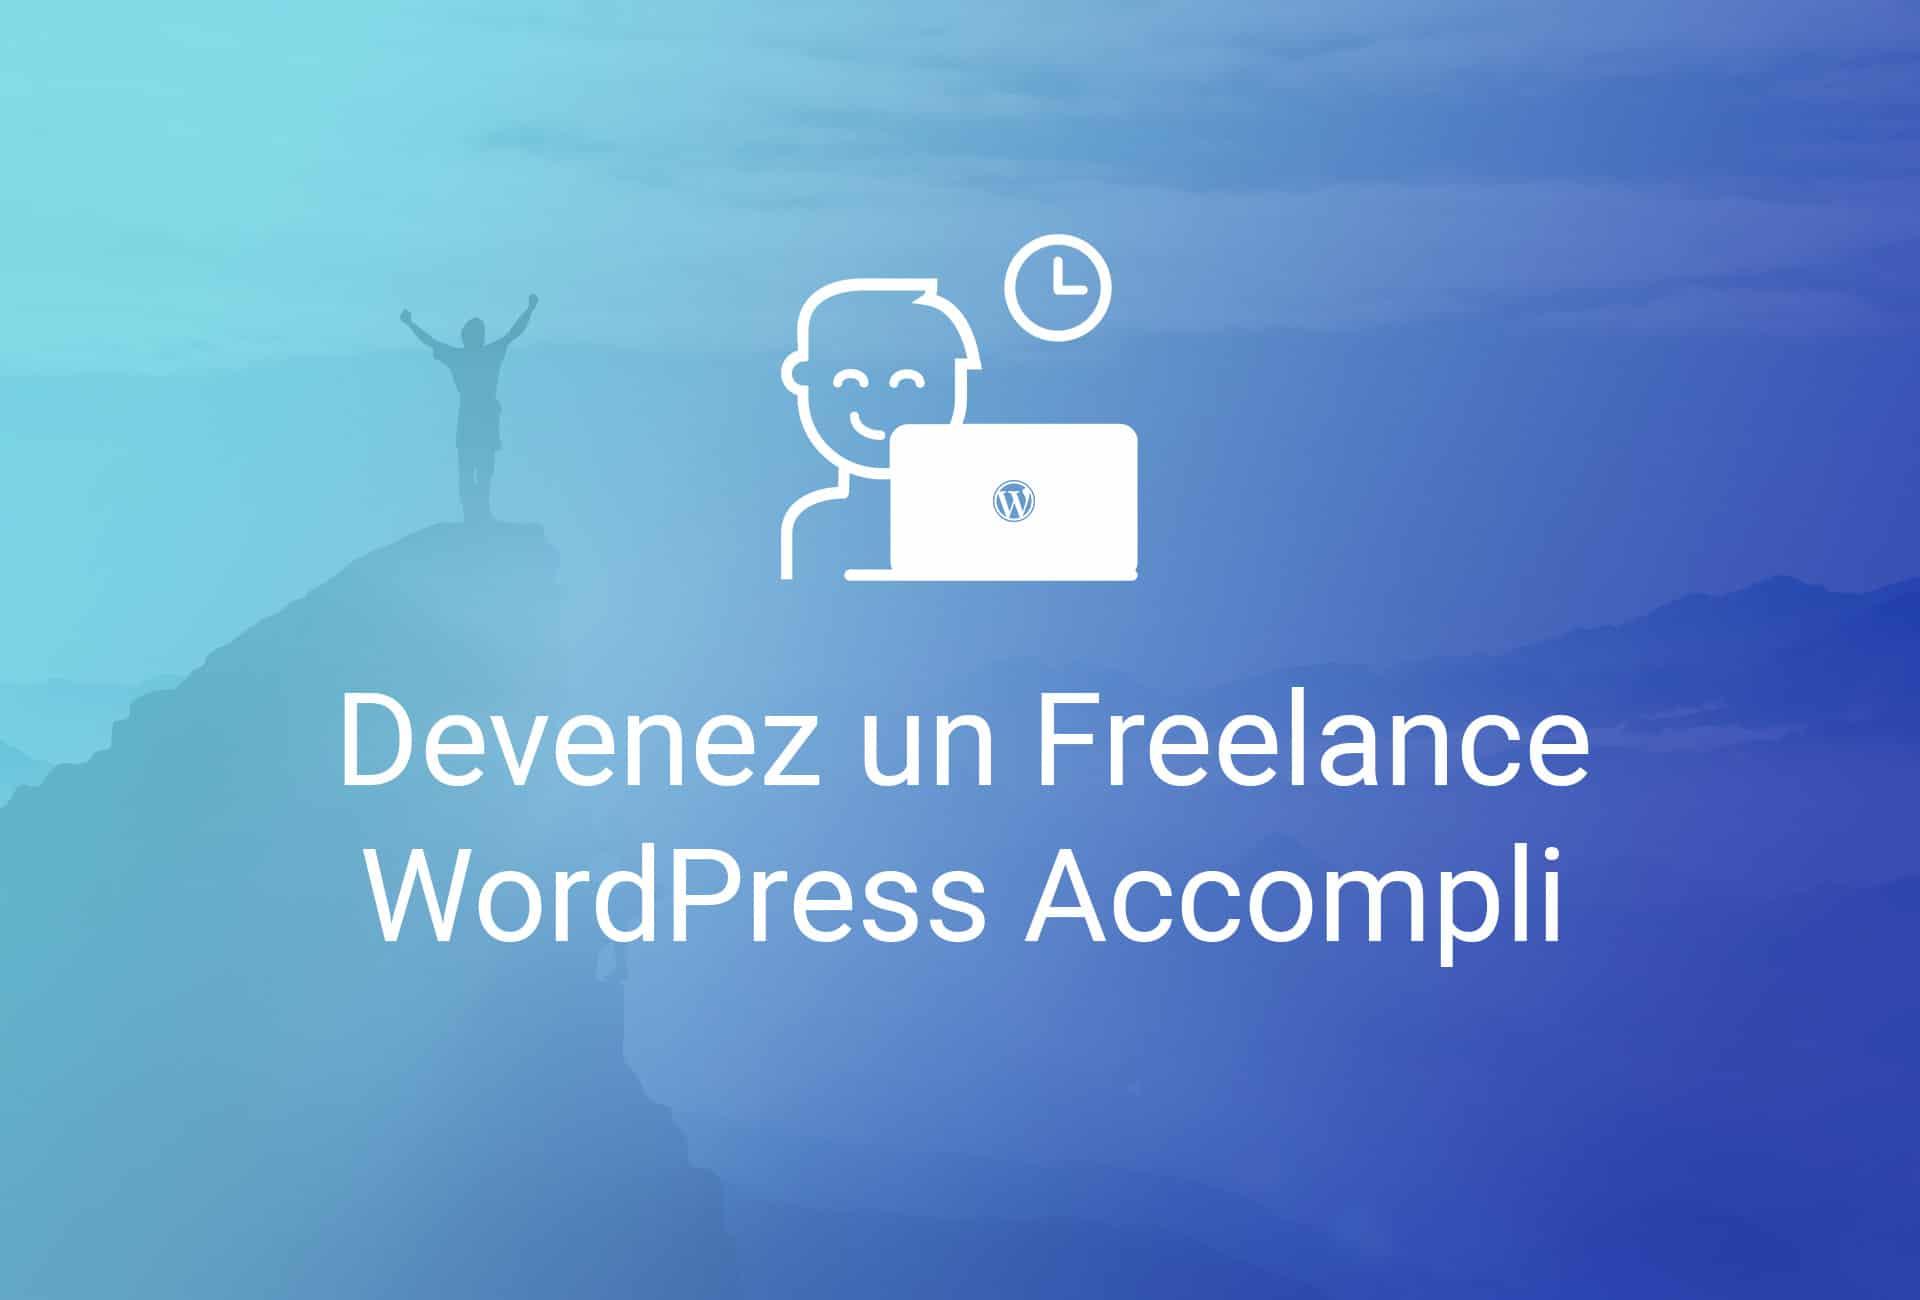 Devenez un freelance WordPress accompli – Basique